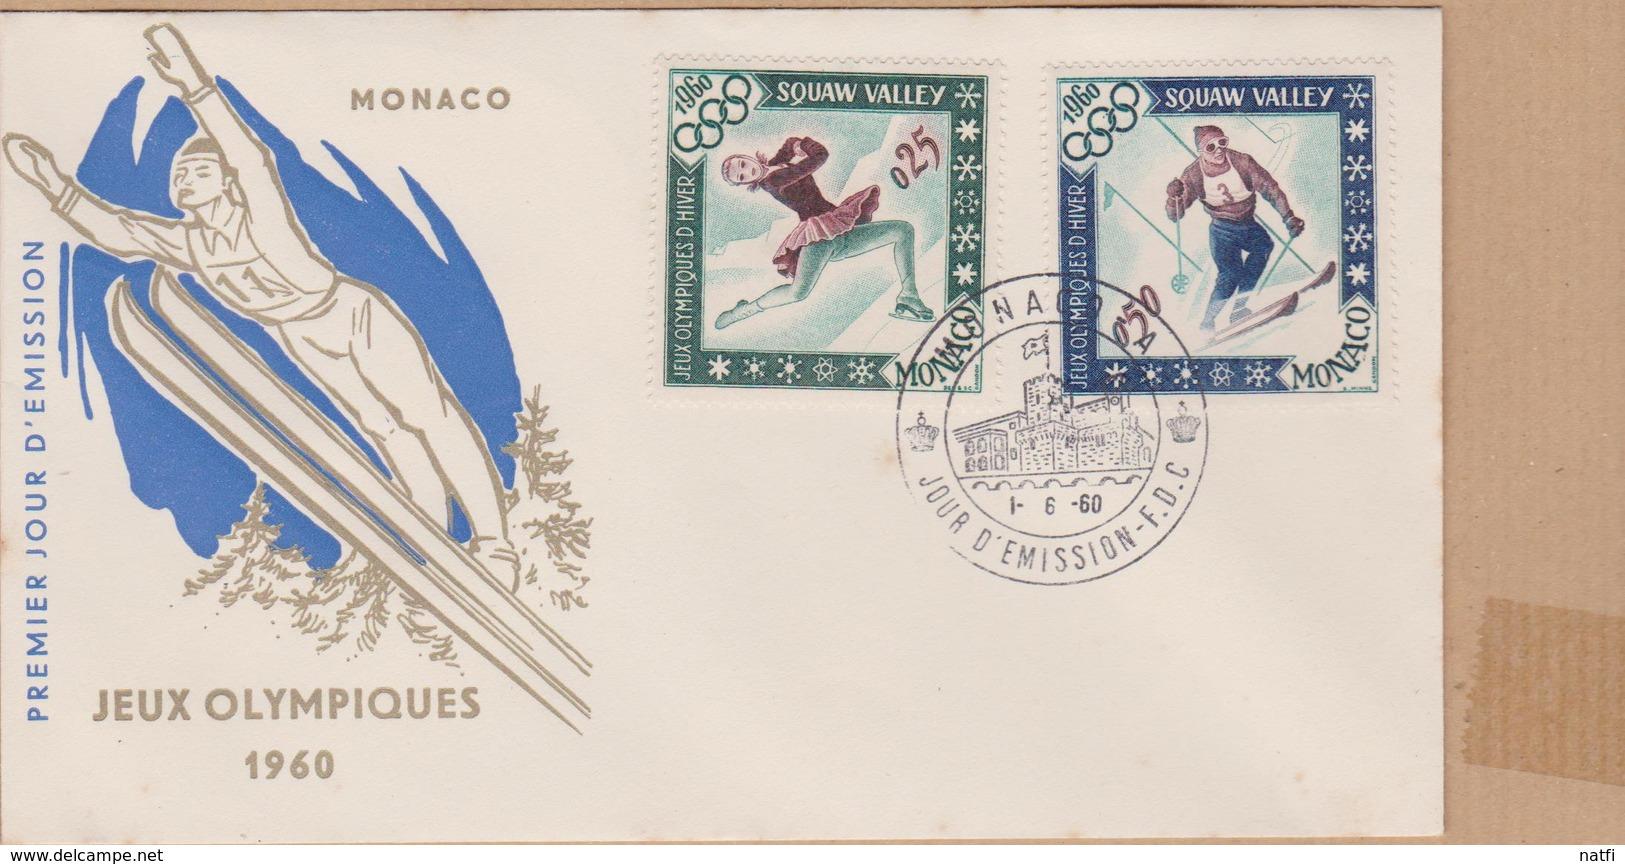 ENVELOPPE TIMBRE  MONACO 1960  JEUX OLYMPIQUES SQUAW VALLEY VOIR PHOTO - FDC